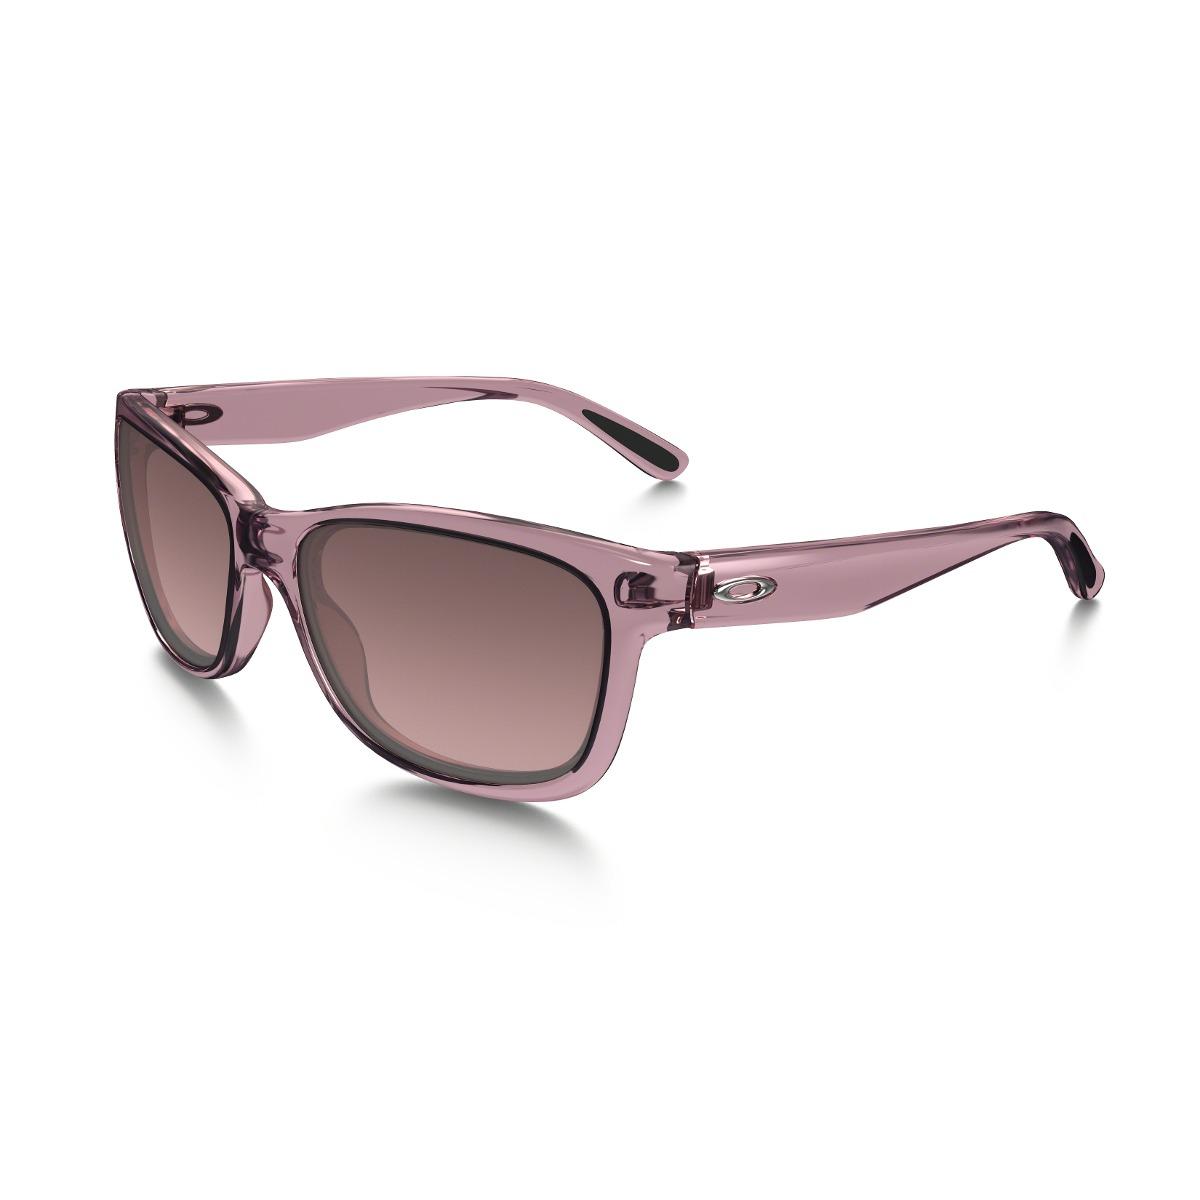 8af09050fe548 Lentes de sol de dama oakley forehand rosado traslúcido cargando zoom jpg  1200x1200 Lentes para mujer